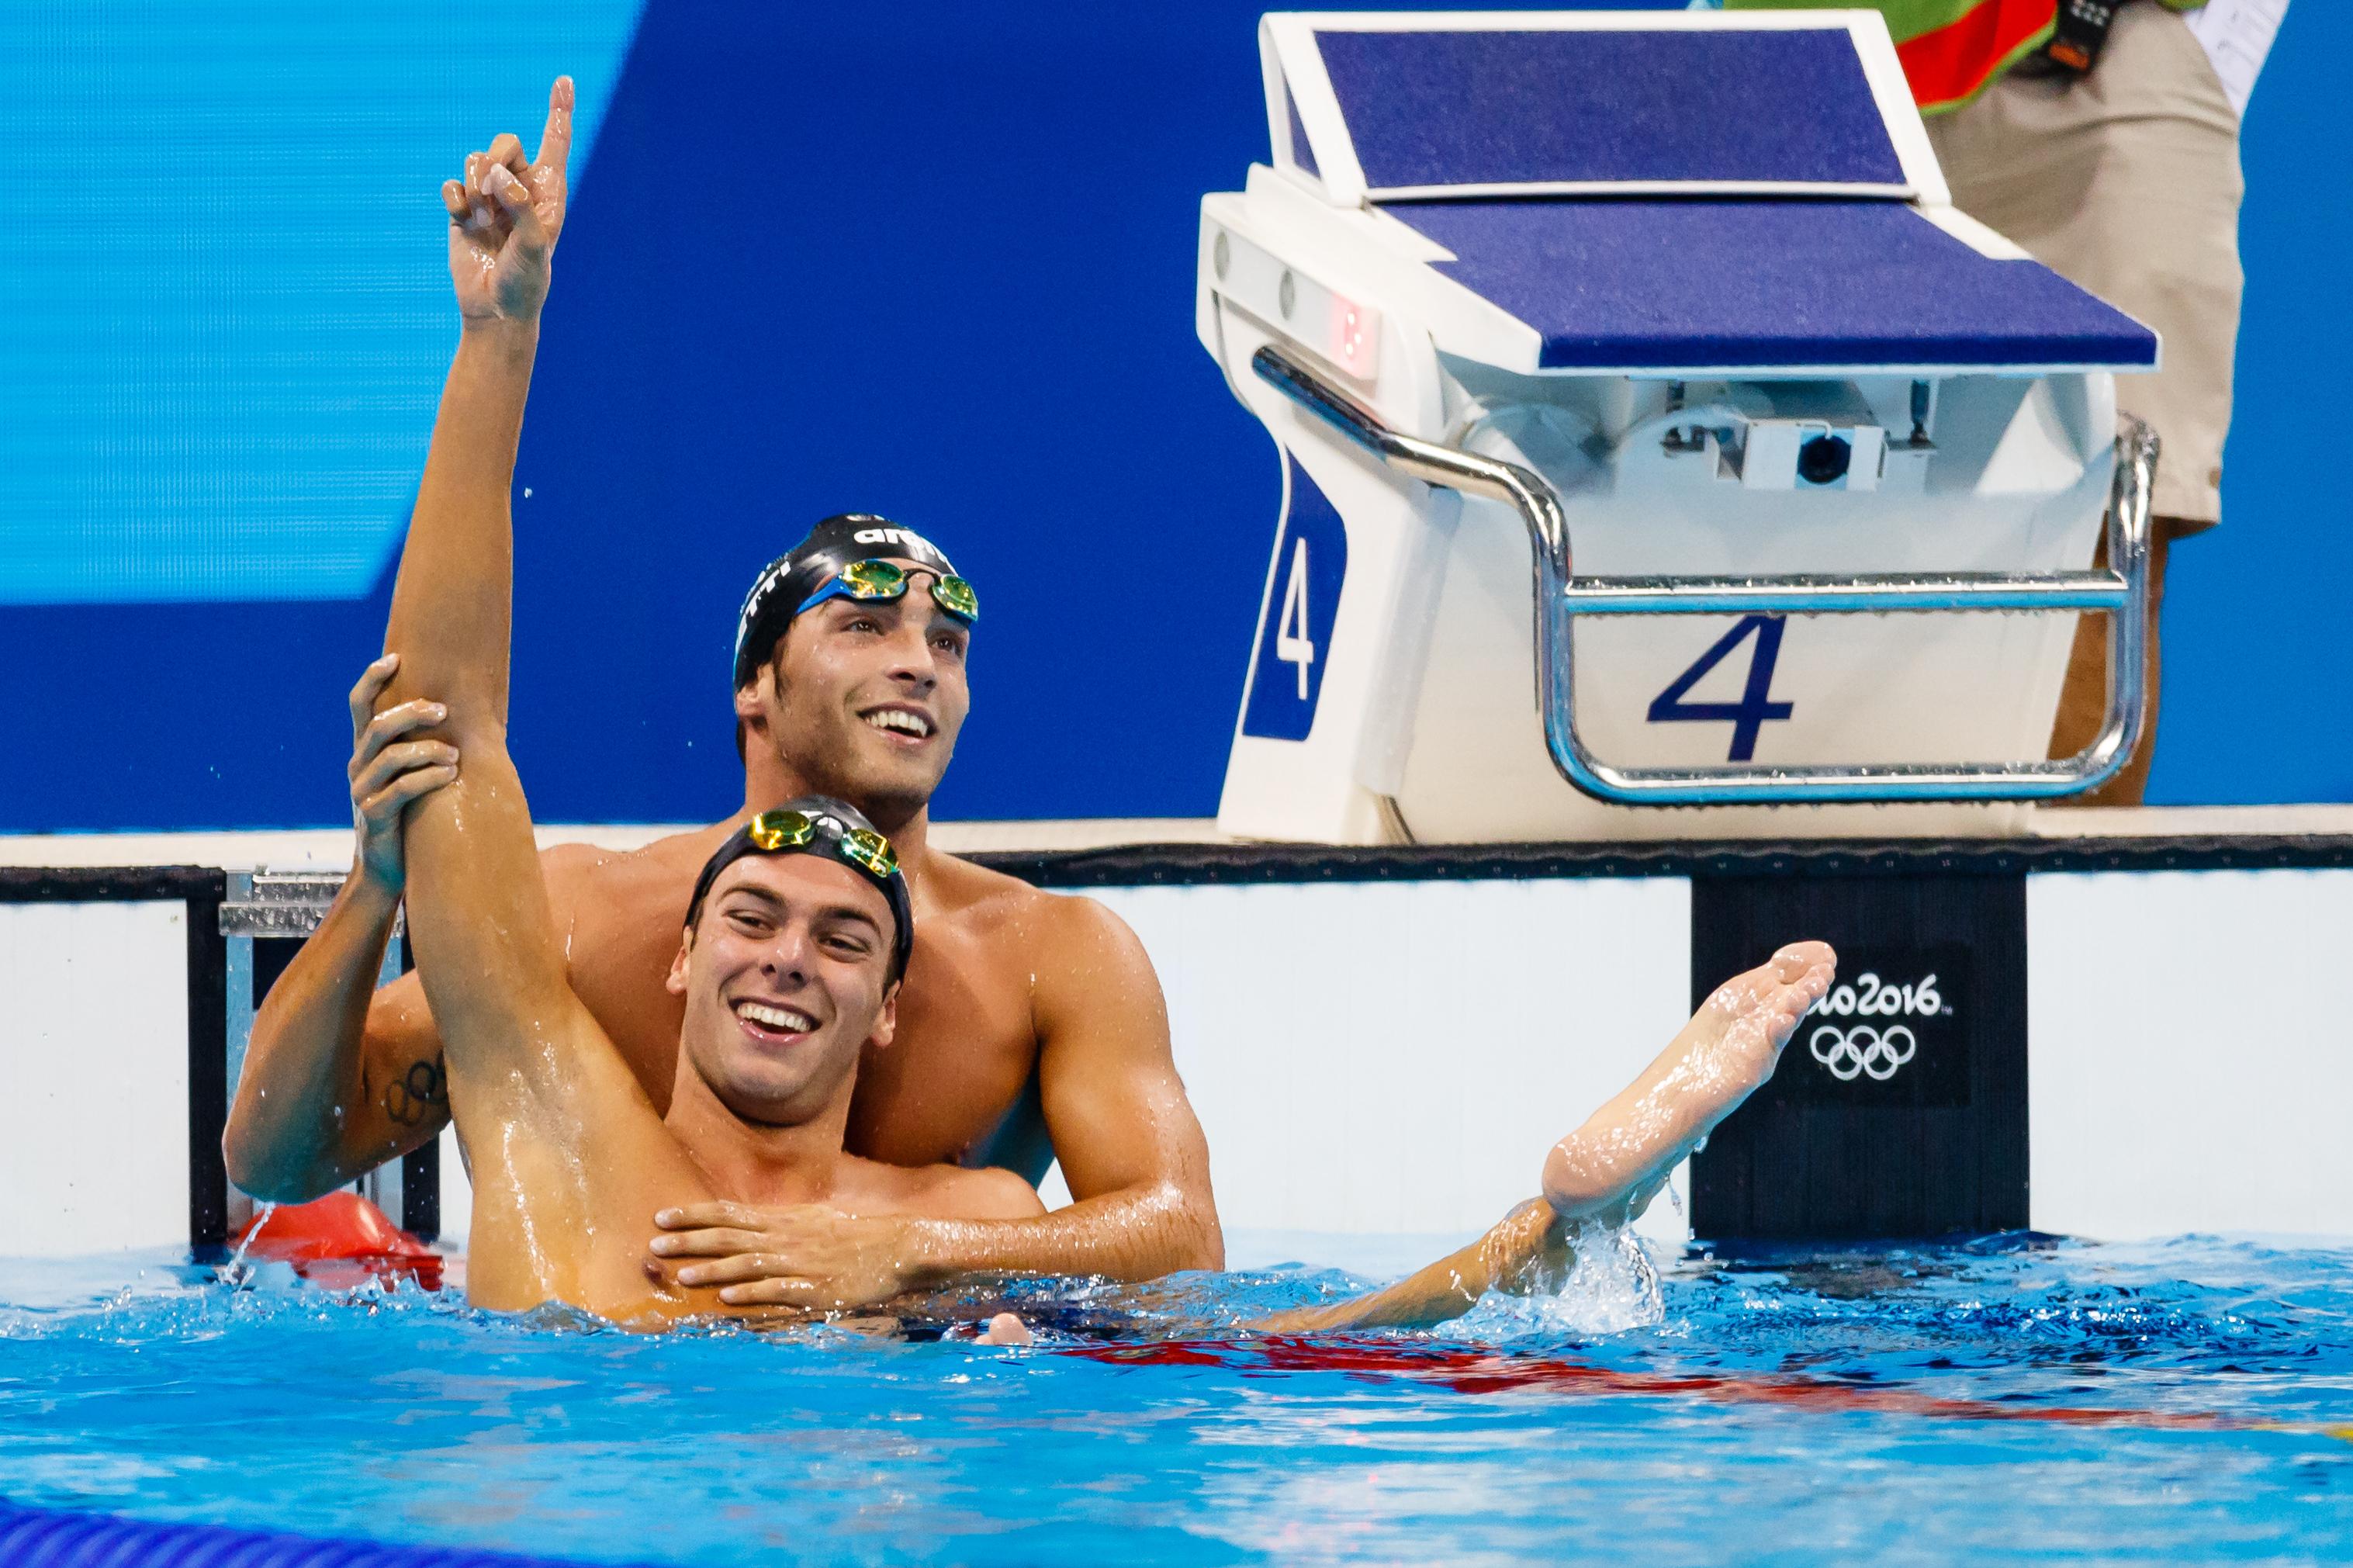 Italian Olympic swimmer Gregorio Paltrinieri